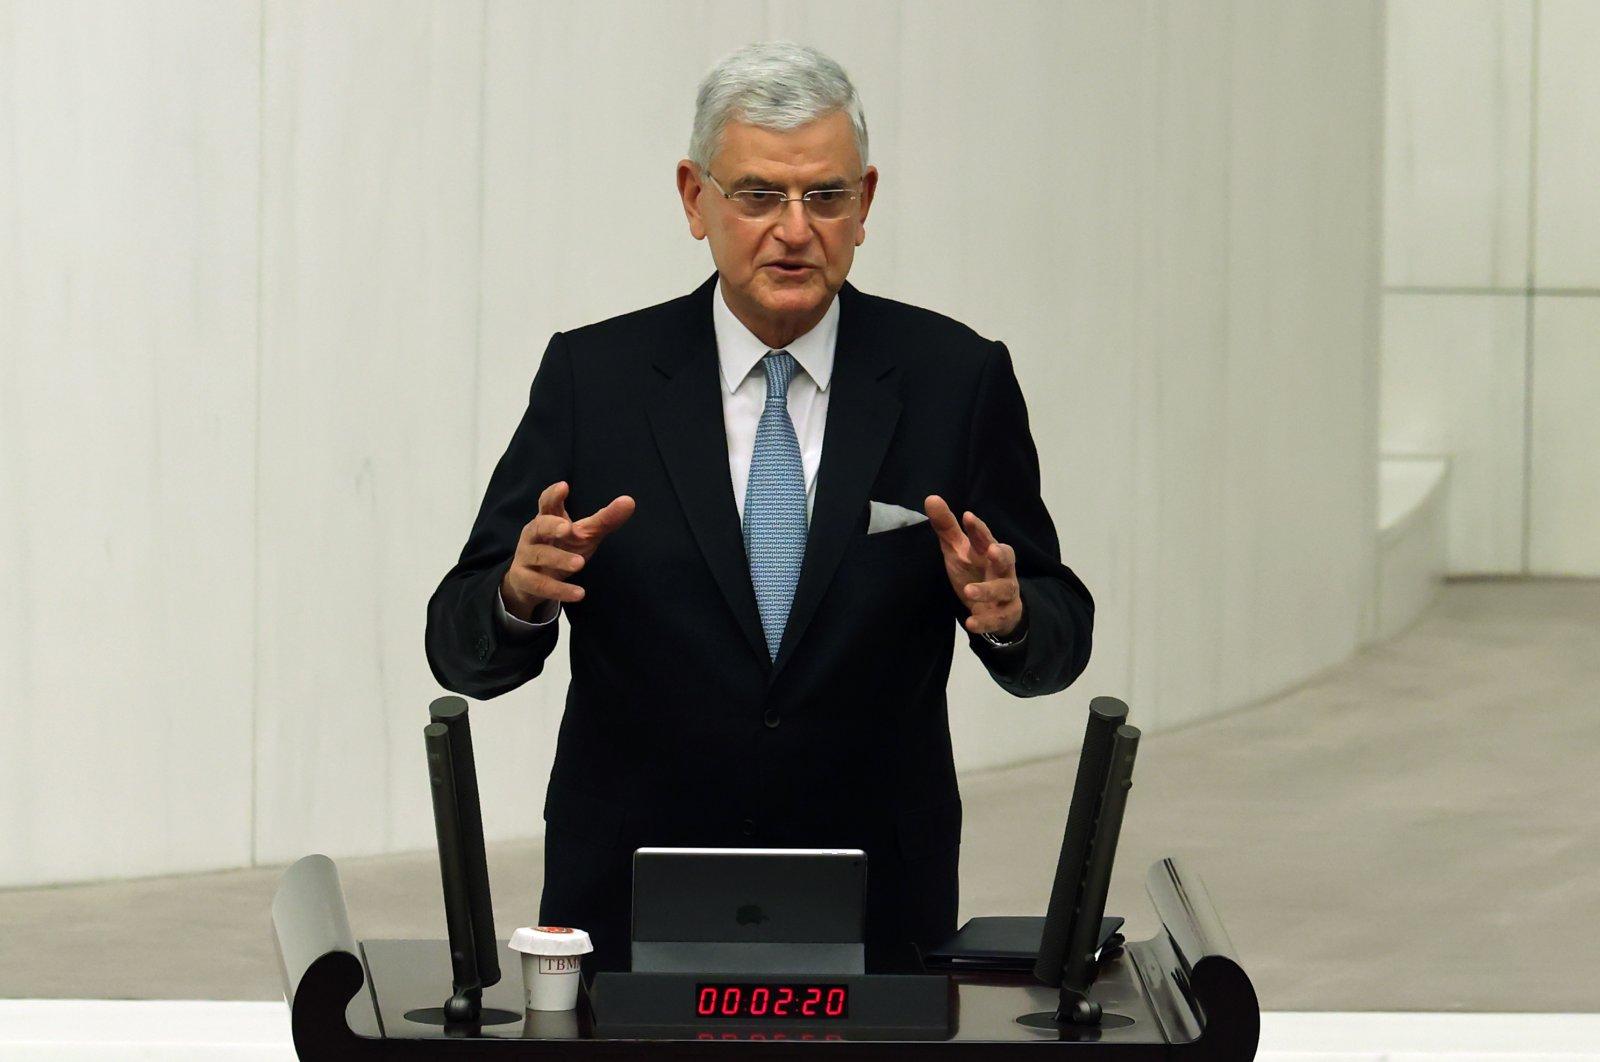 The president of the U.N. General Assembly, Volkan Bozkır, gives a speech at the Turkish Parliament, Ankara, Turkey, April 6, 2021. (AA Photo)